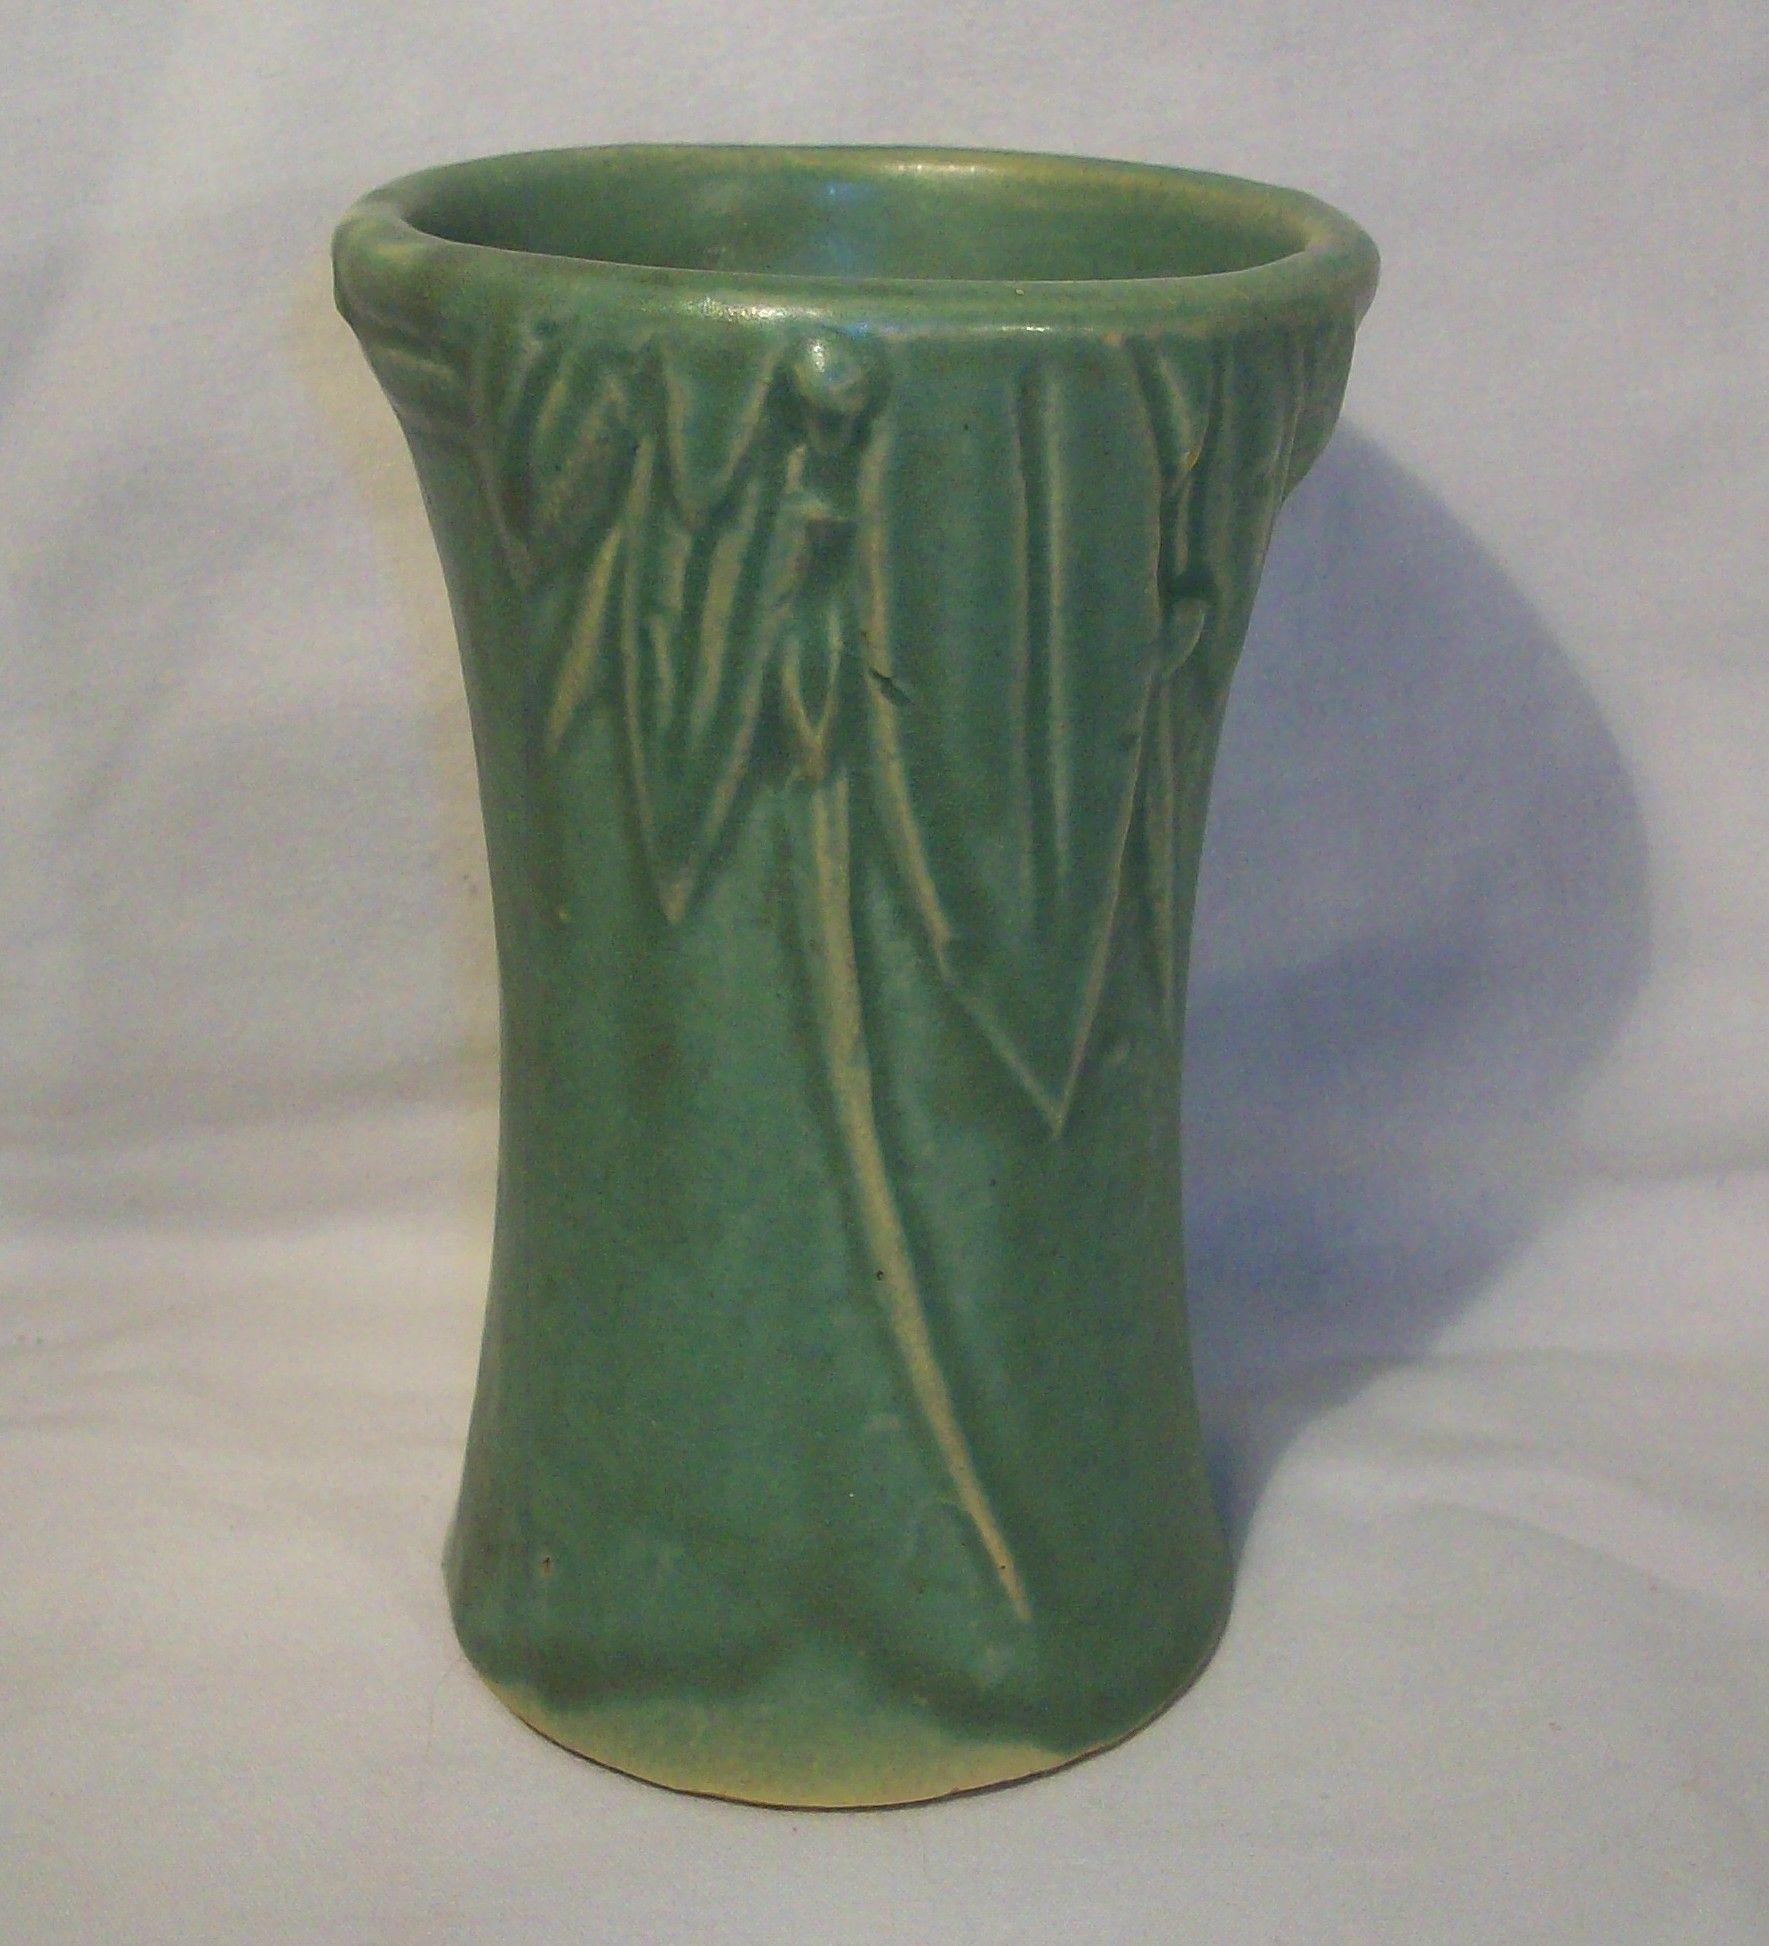 1930s mccoy pottery matte glaze leaves berries vase vintage 1930s mccoy pottery matte glaze leaves berries vase reviewsmspy